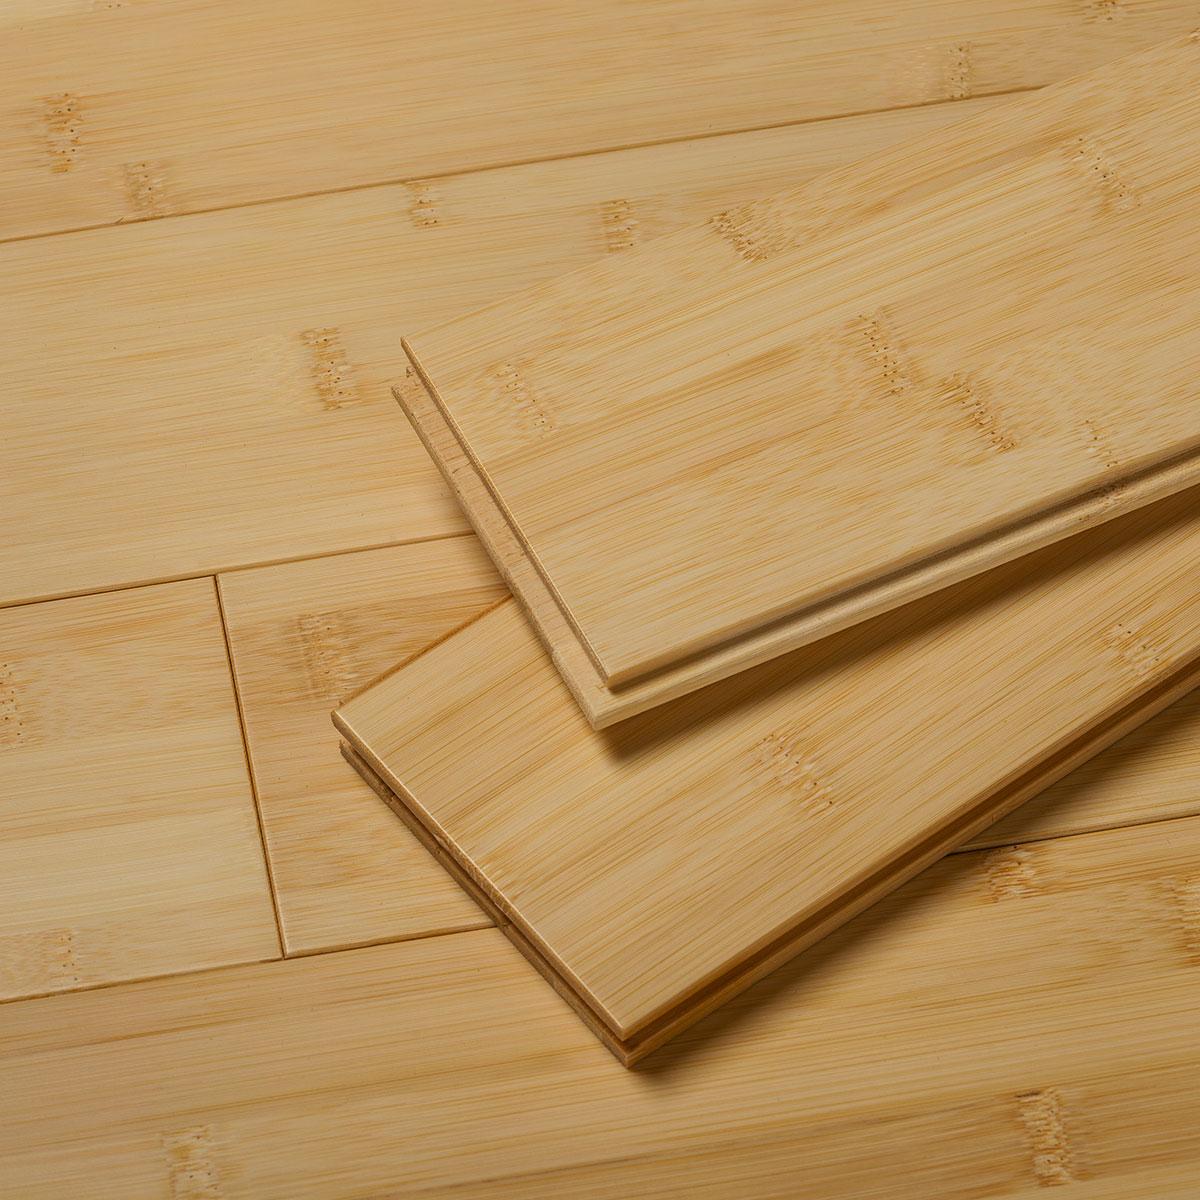 Plyboo flat grain bamboo flooring